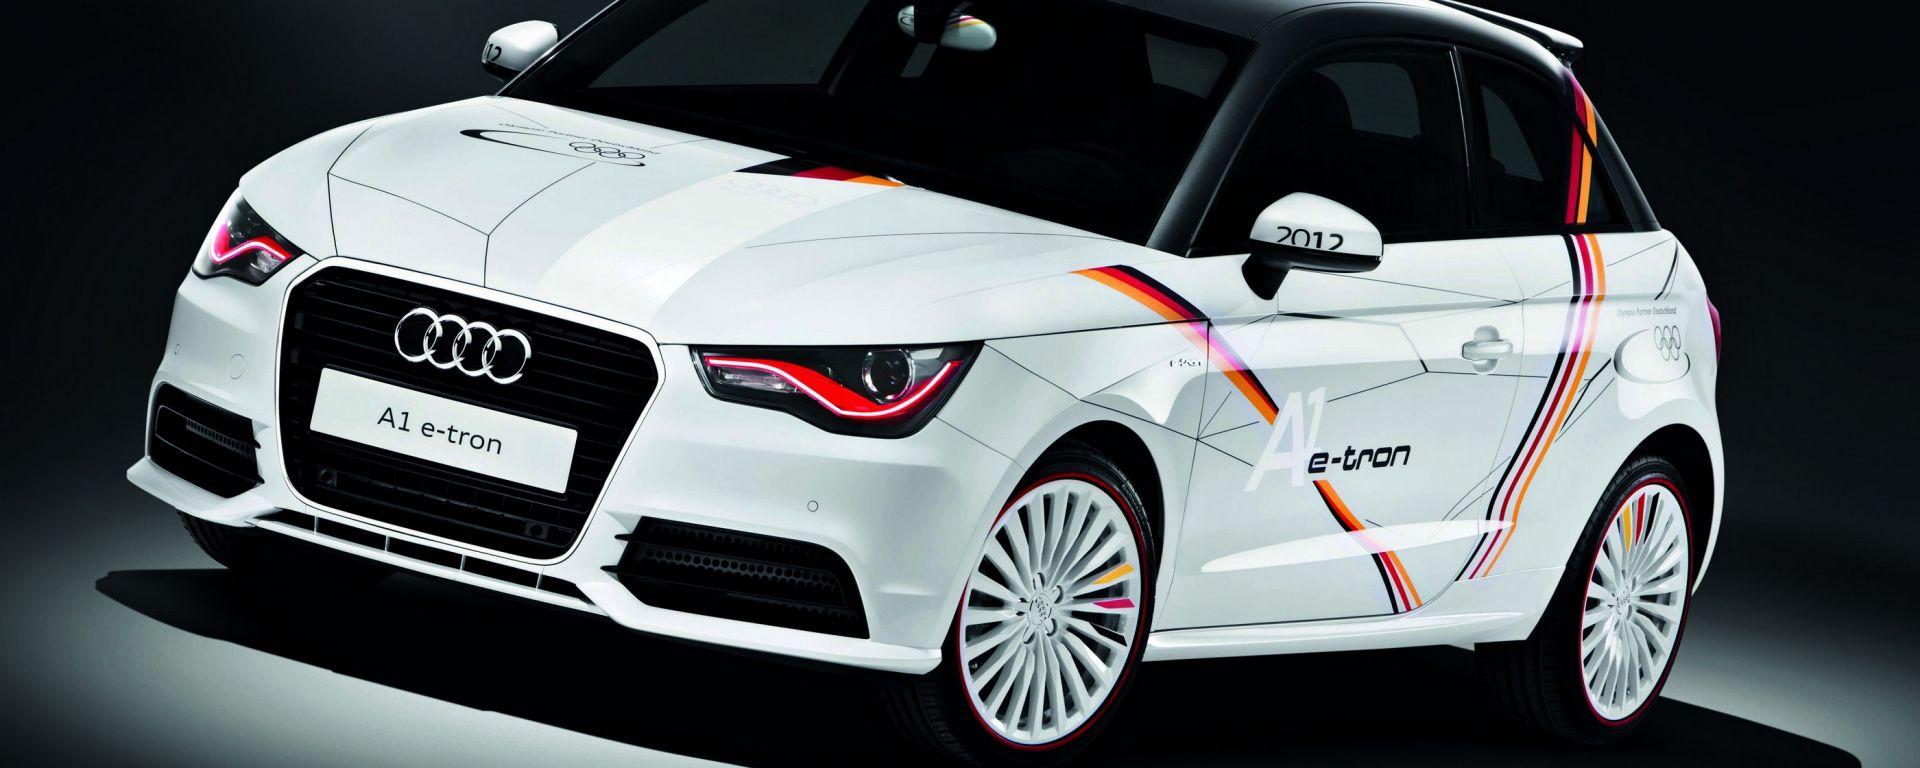 Audi A1 e-tron German Olympic Team